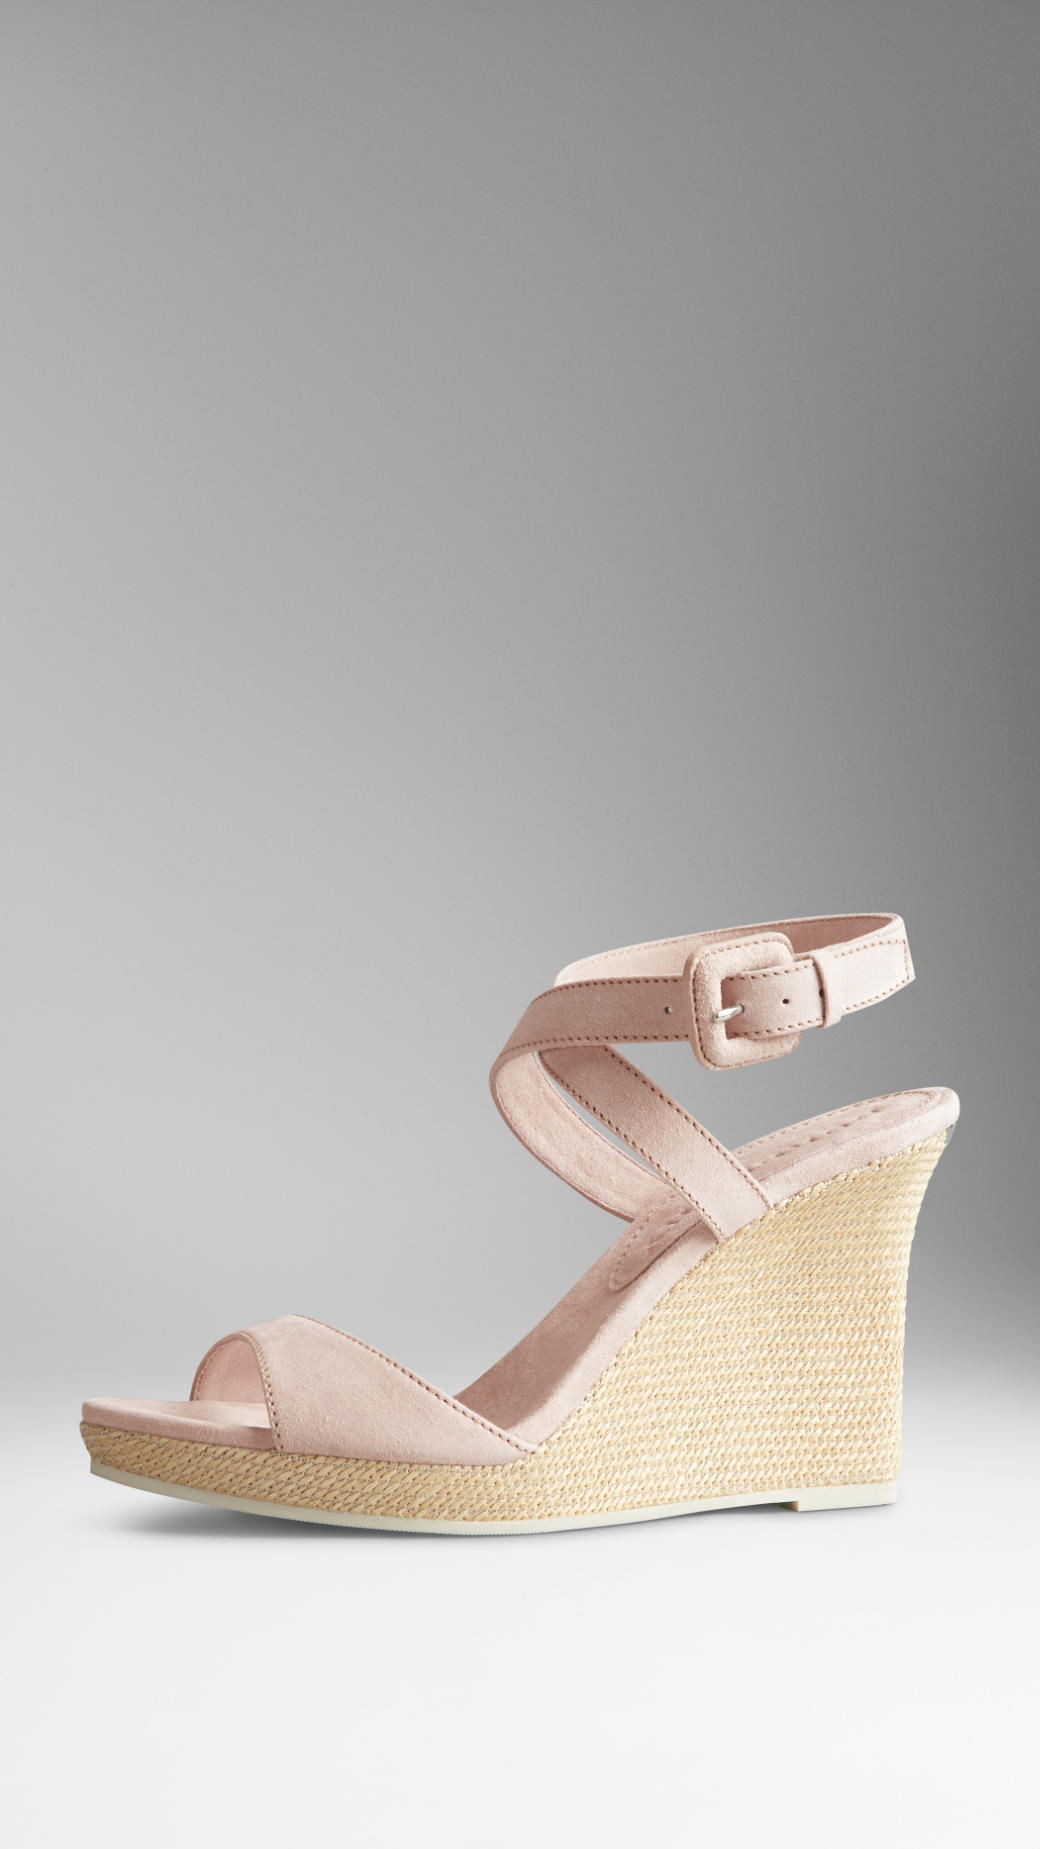 Gallery - Burberry Suede Platform Wedge Sandals In Pink Lyst